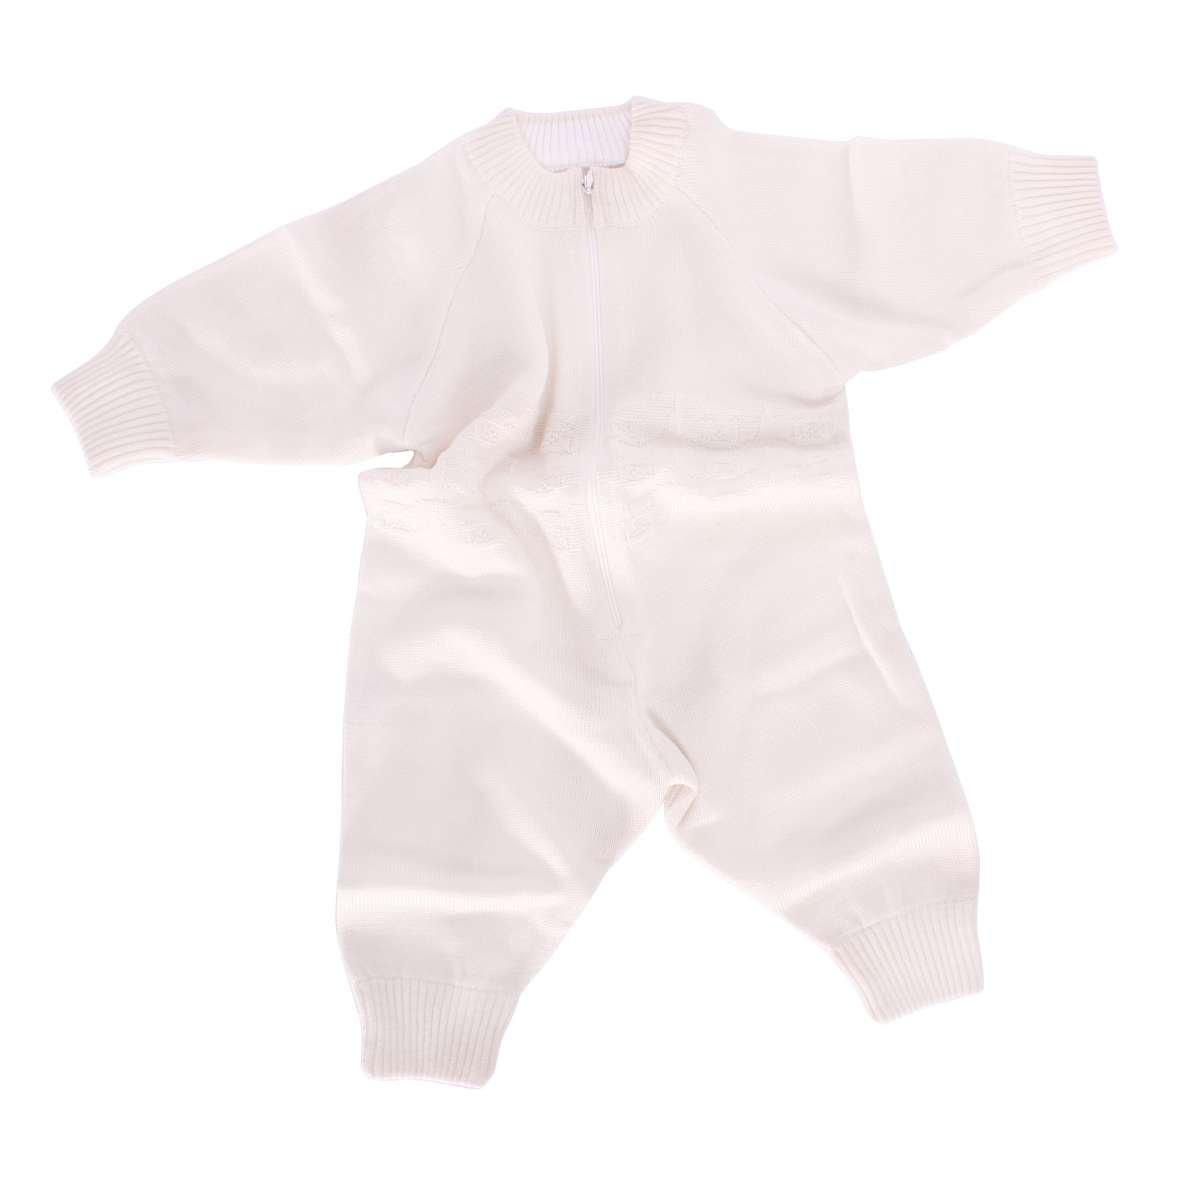 Lenne Wool Overall Jessil Bērnu silts vilnas kombinezons uzsvārcis